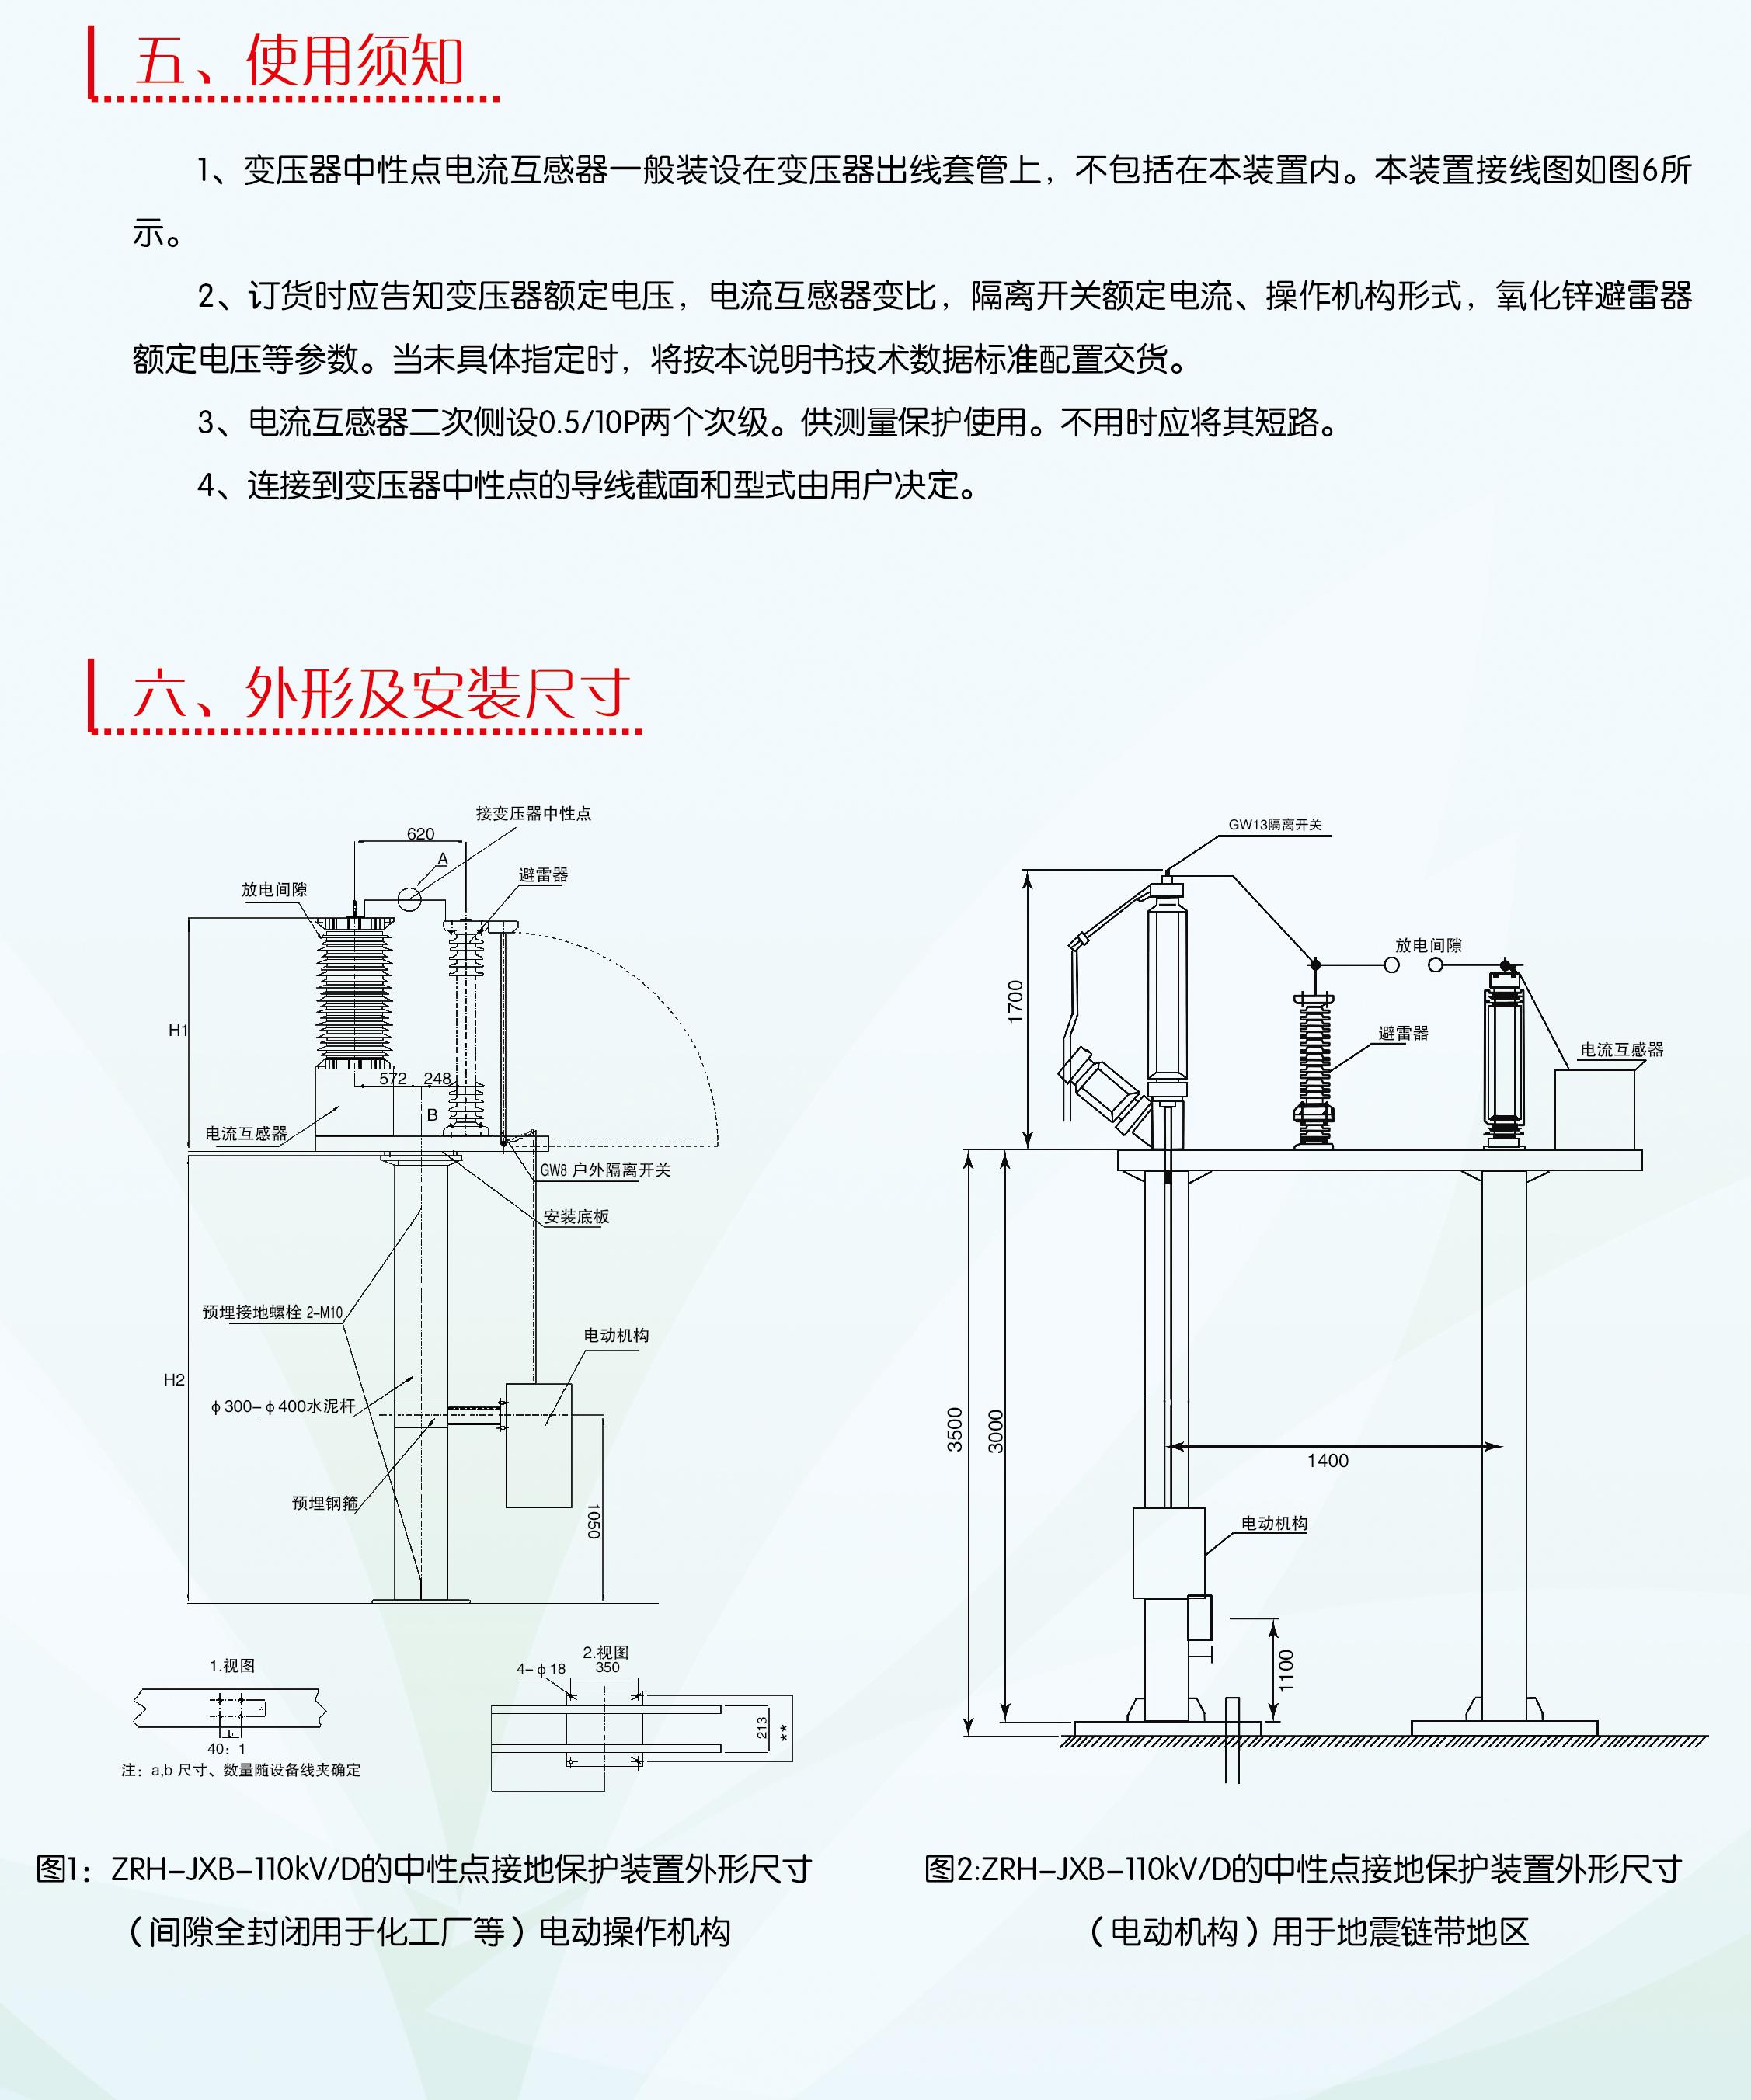 ZRH-JXB 系列变压器中性点间隙接地保护装置